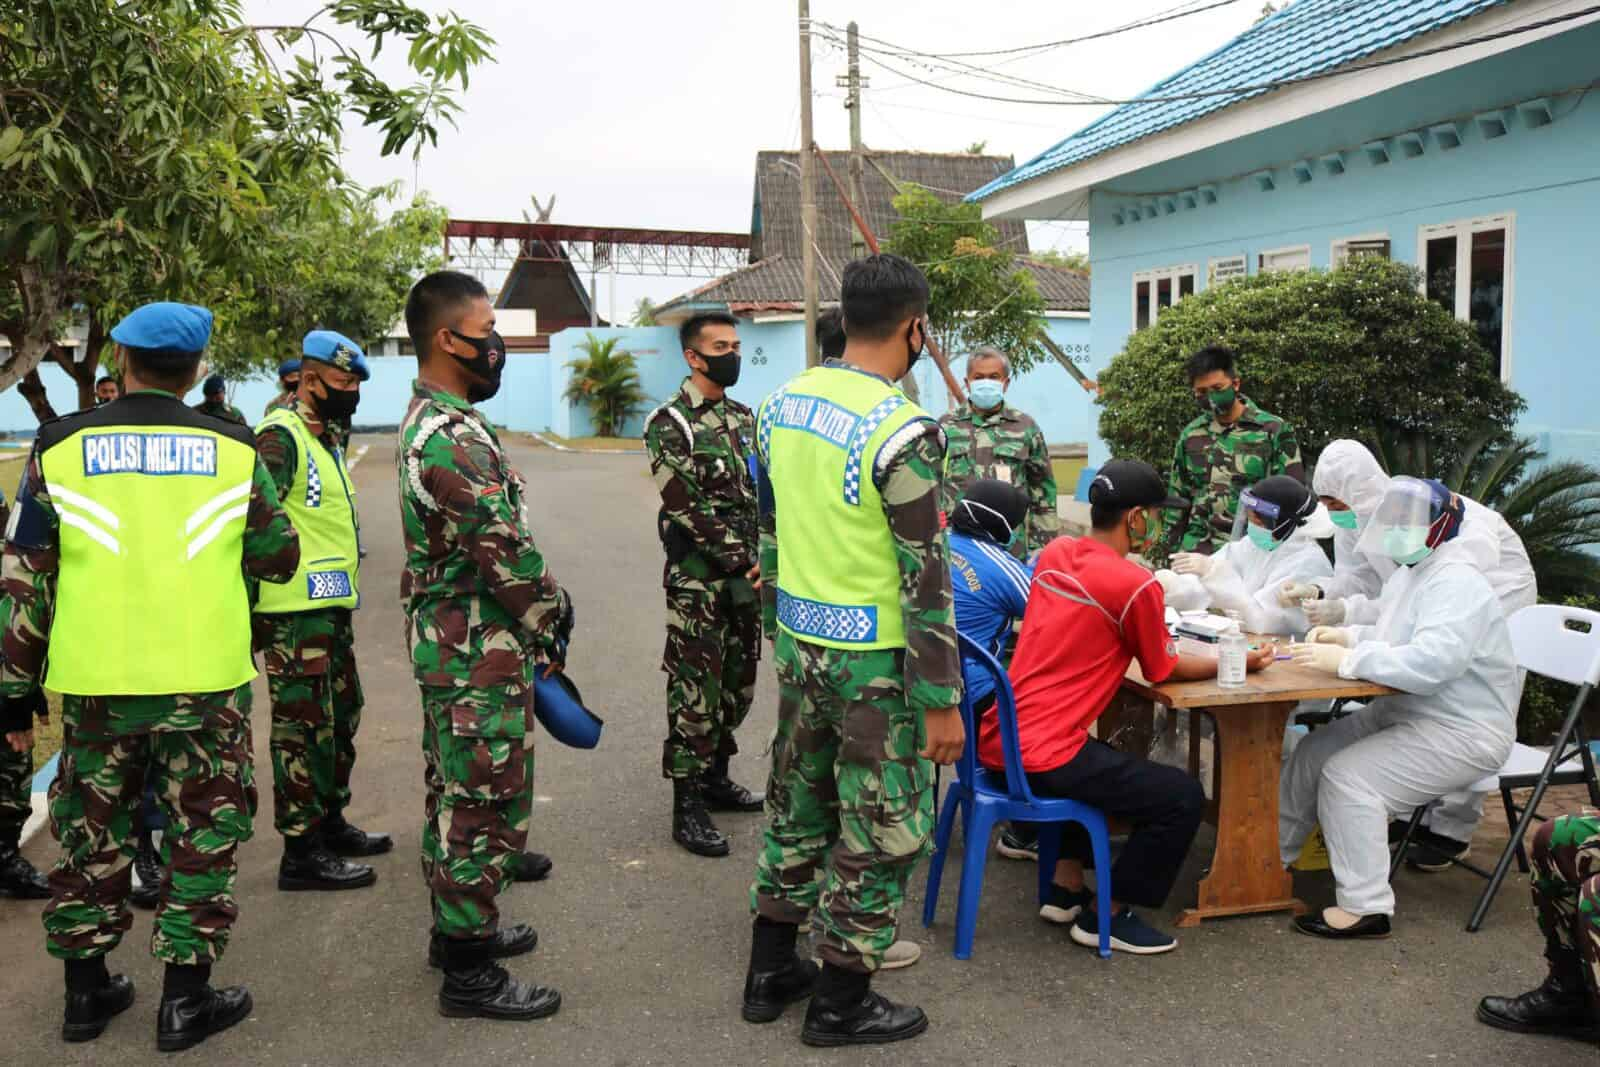 Keluarga Besar Lanud Sjamsudin Noor Laksanakan Rapid Test Secara Serentak Dalam Rangka Menjaga Prajurit dan Keluarga Dari Covid-19